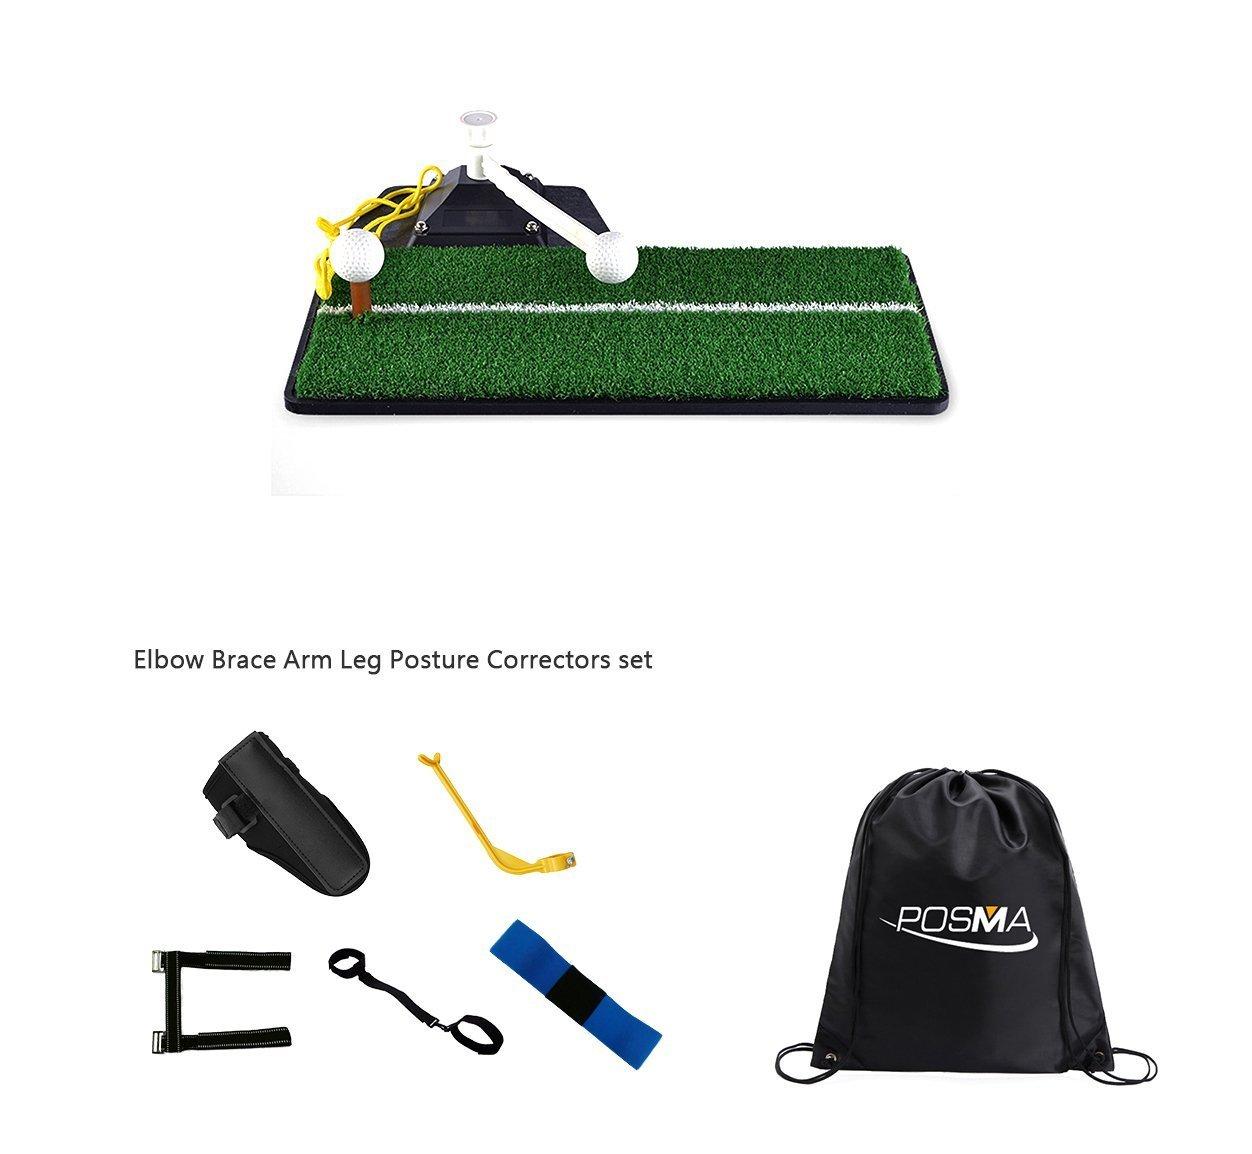 Posma ST070Aゴルフ練習スイングマットバンドルギフトセットで5ピース肘ブレースアーム脚姿勢コレクターセット用屋内   B07D58H41R